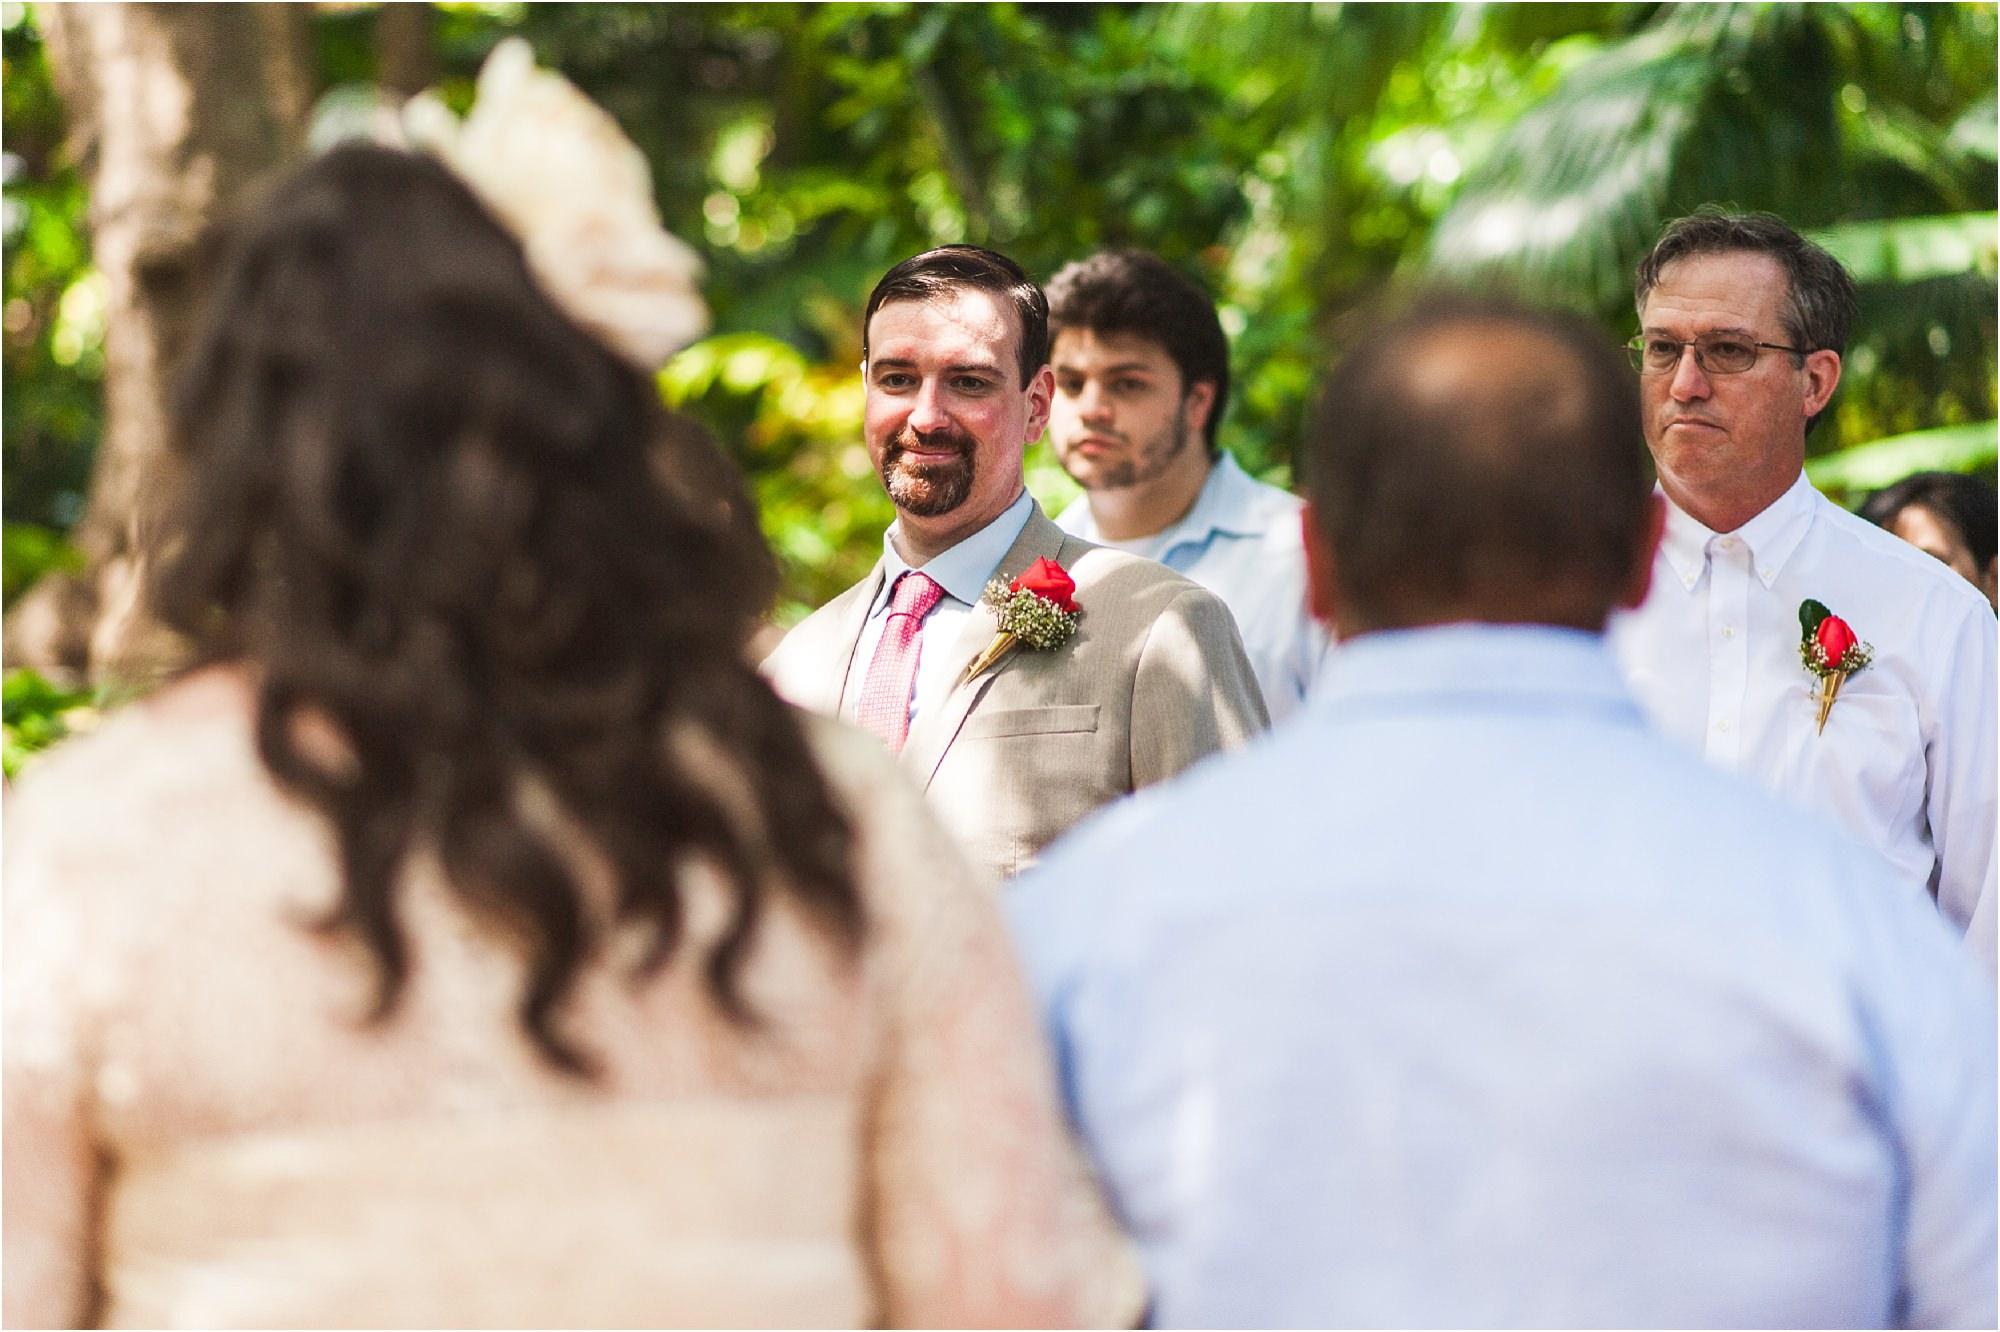 outdoor-rustic-pincrest-gardens-wedding-miami-photographer-jessenia-gonzalez_1030.jpg